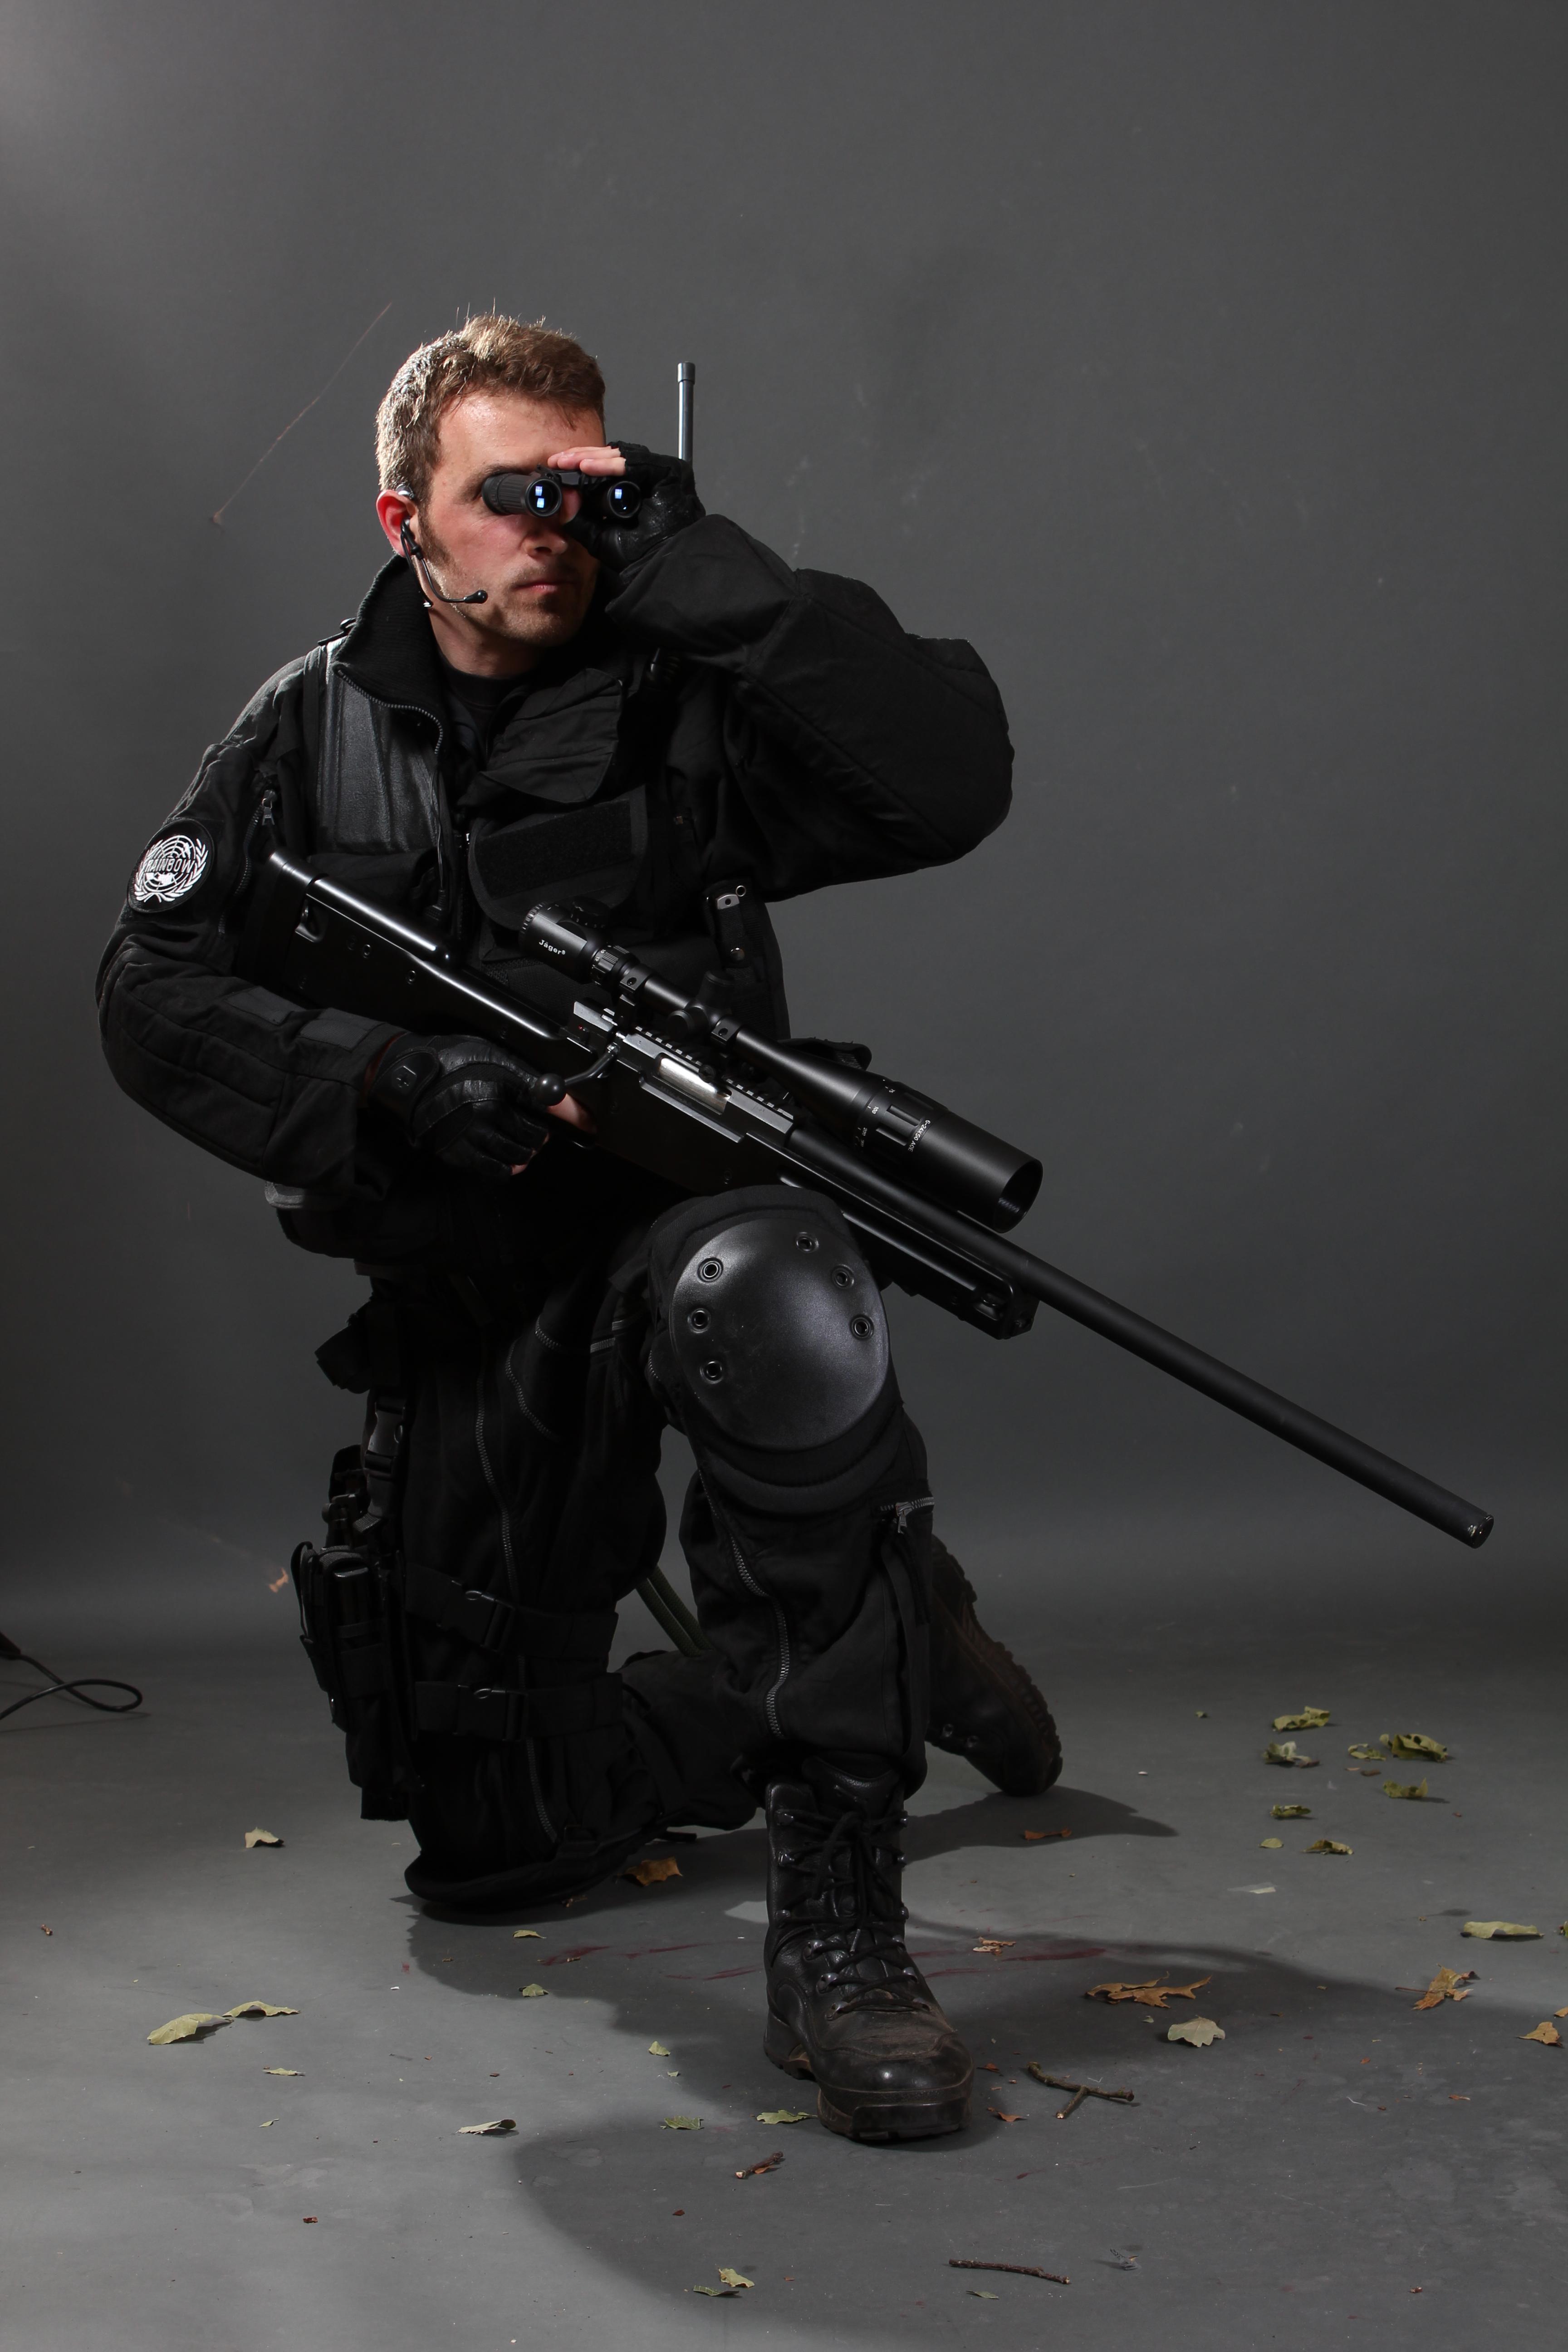 Sniper STOCK III by PhelanDavion